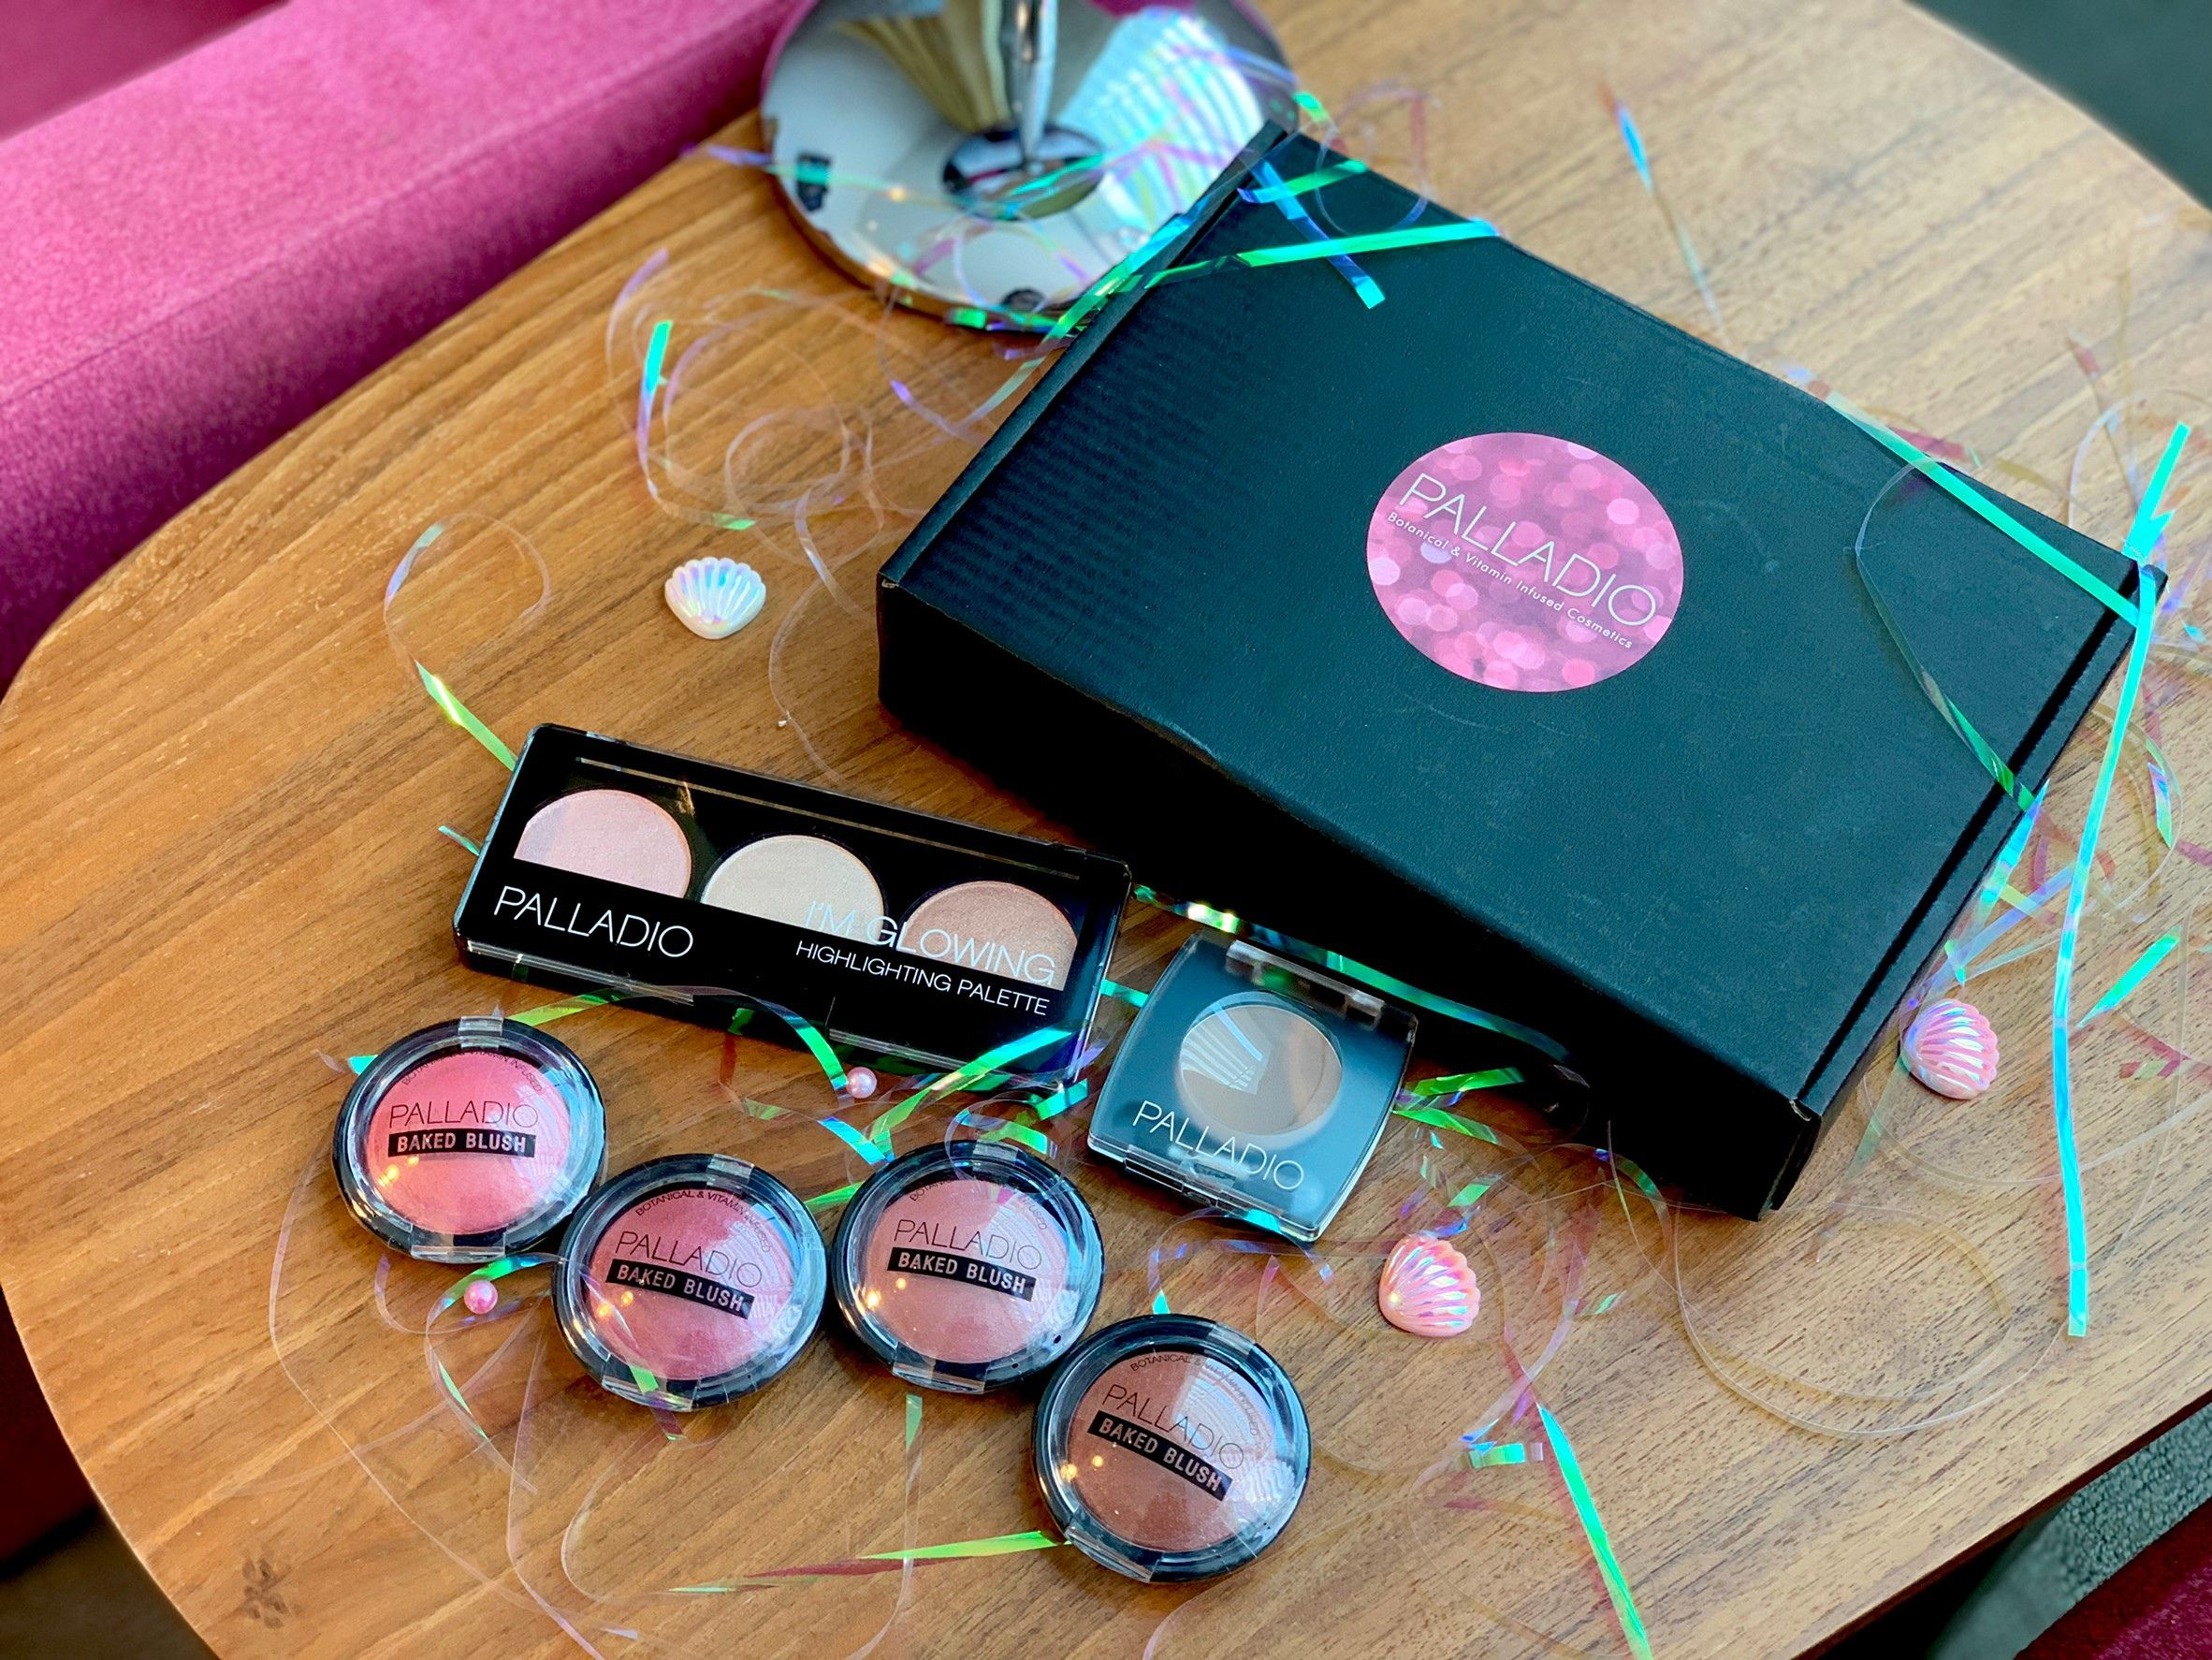 PALLADIO女神光耀系列│美國專業彩妝領導品牌,廣泛用於好萊塢片場/時裝伸展臺【要美麗也要對肌膚有益】光耀女神系列彩妝全新上市開箱,締造珍珠質感的高級精緻妝容,由內到外透出好氣色